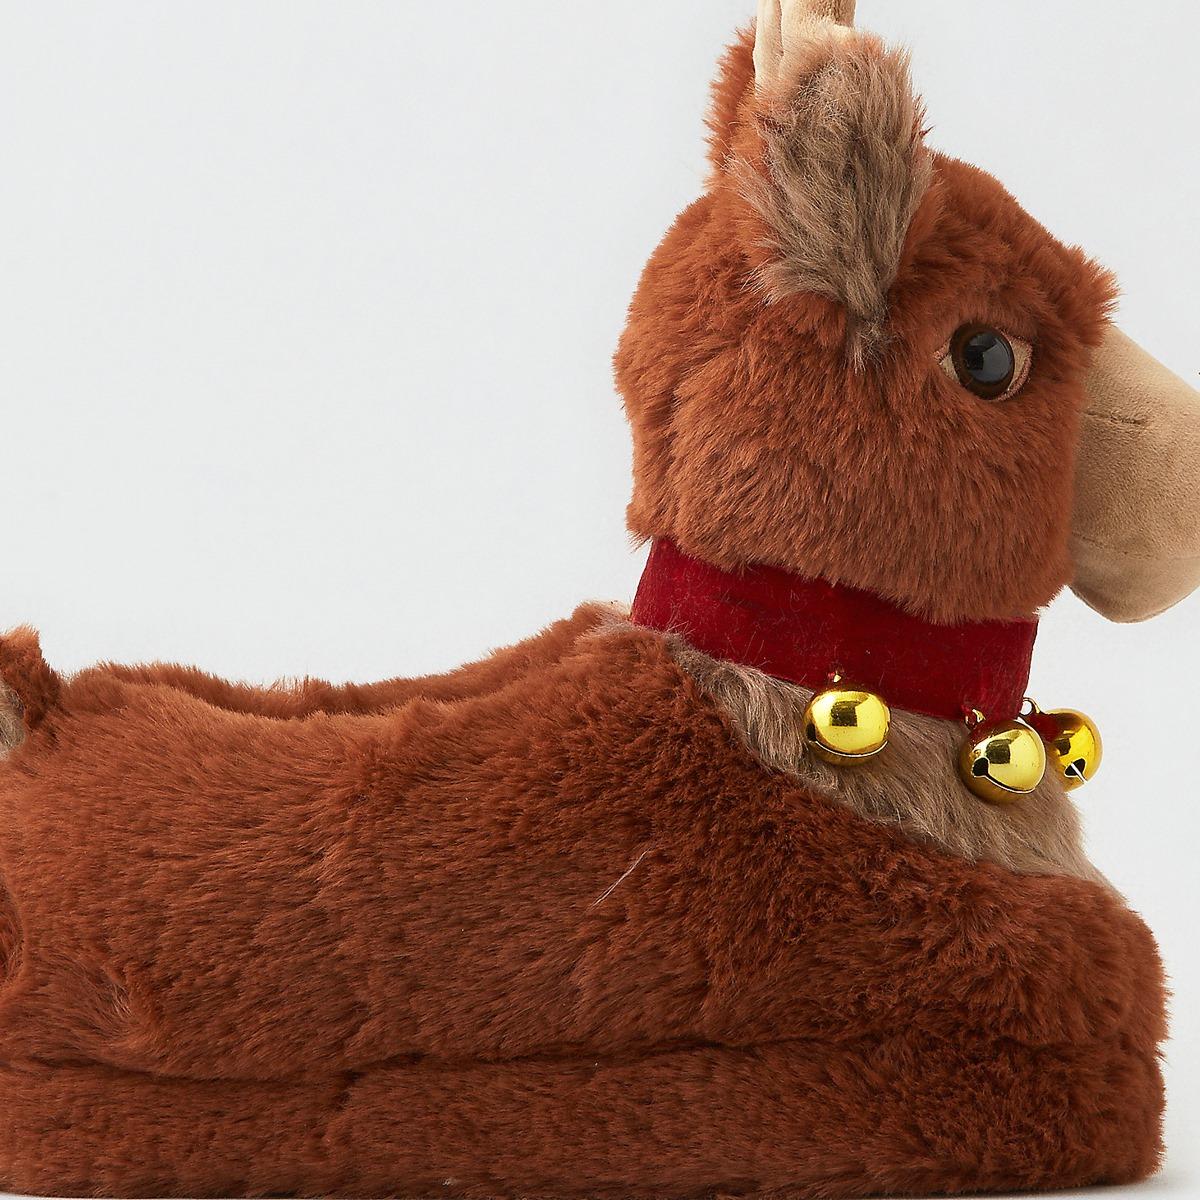 AEOO Reindeer Slipper